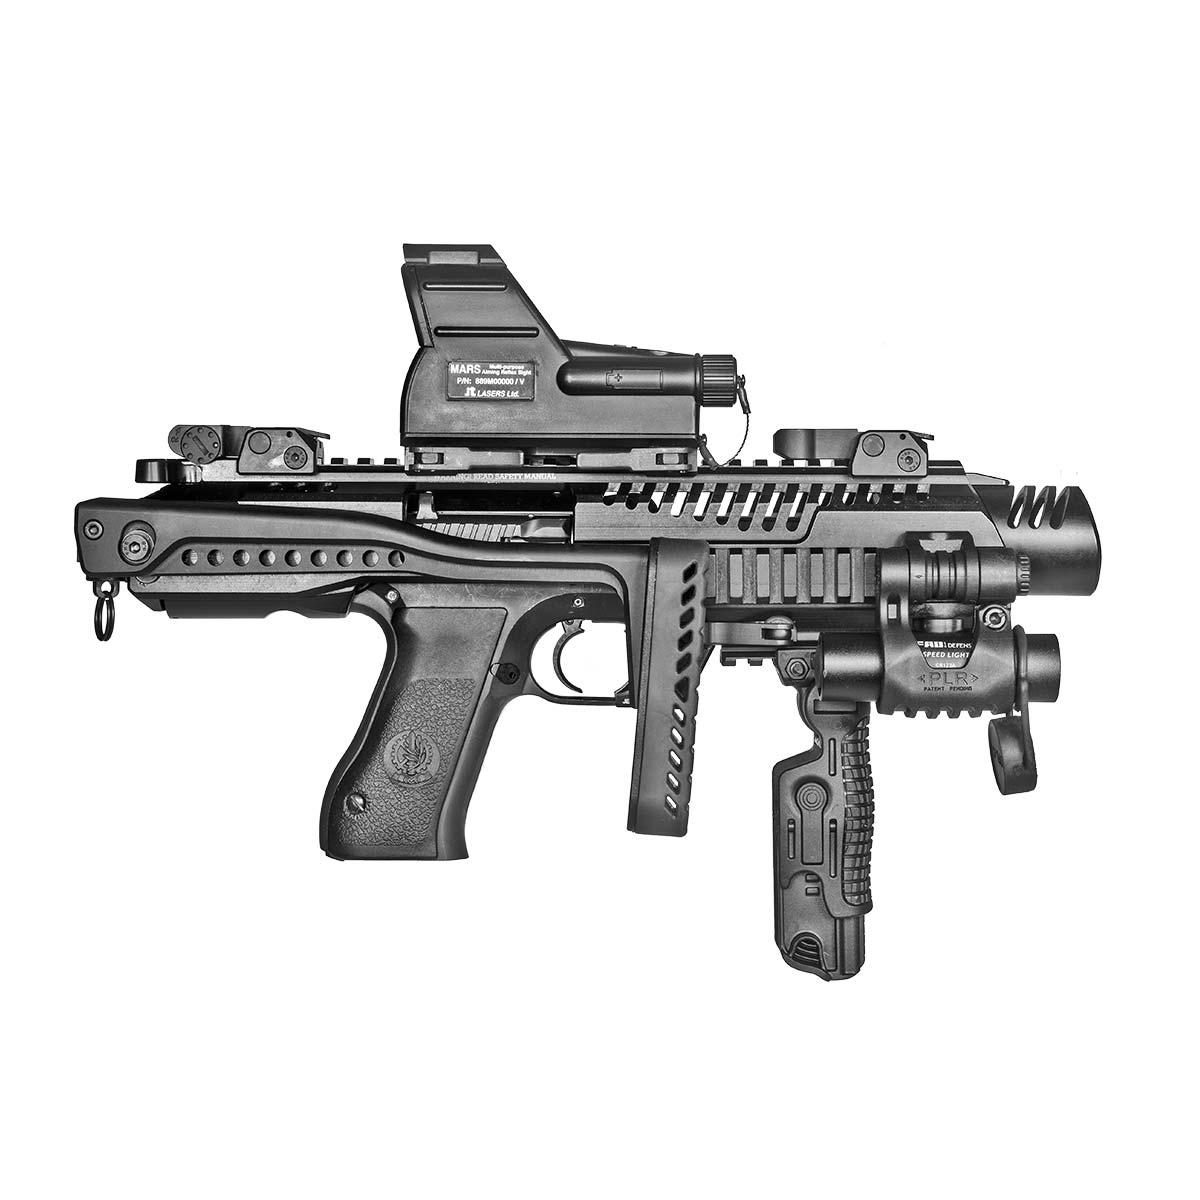 fab-defense-kpos-g2-pdw-conversion-kit-jericho-1